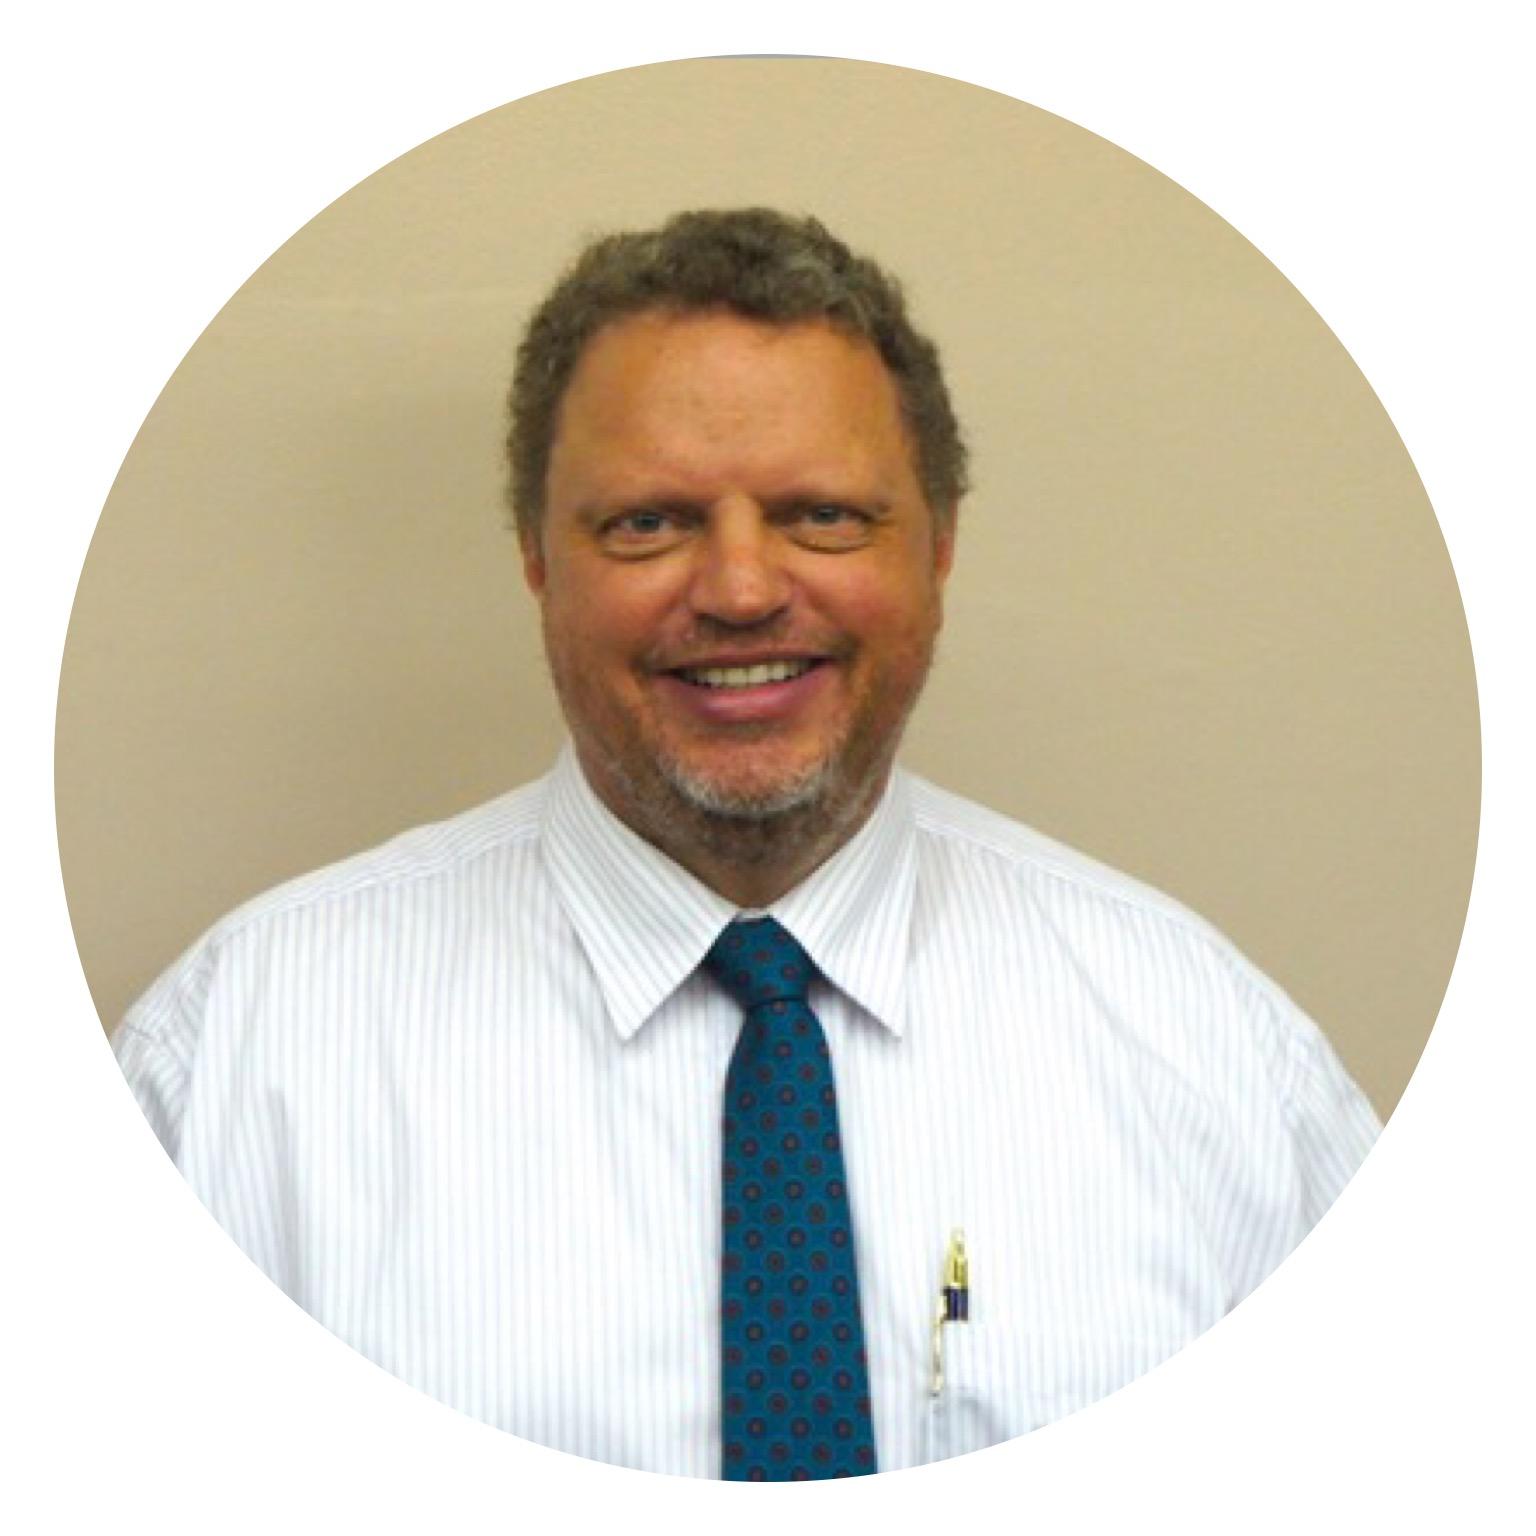 Pastor Dave Benn